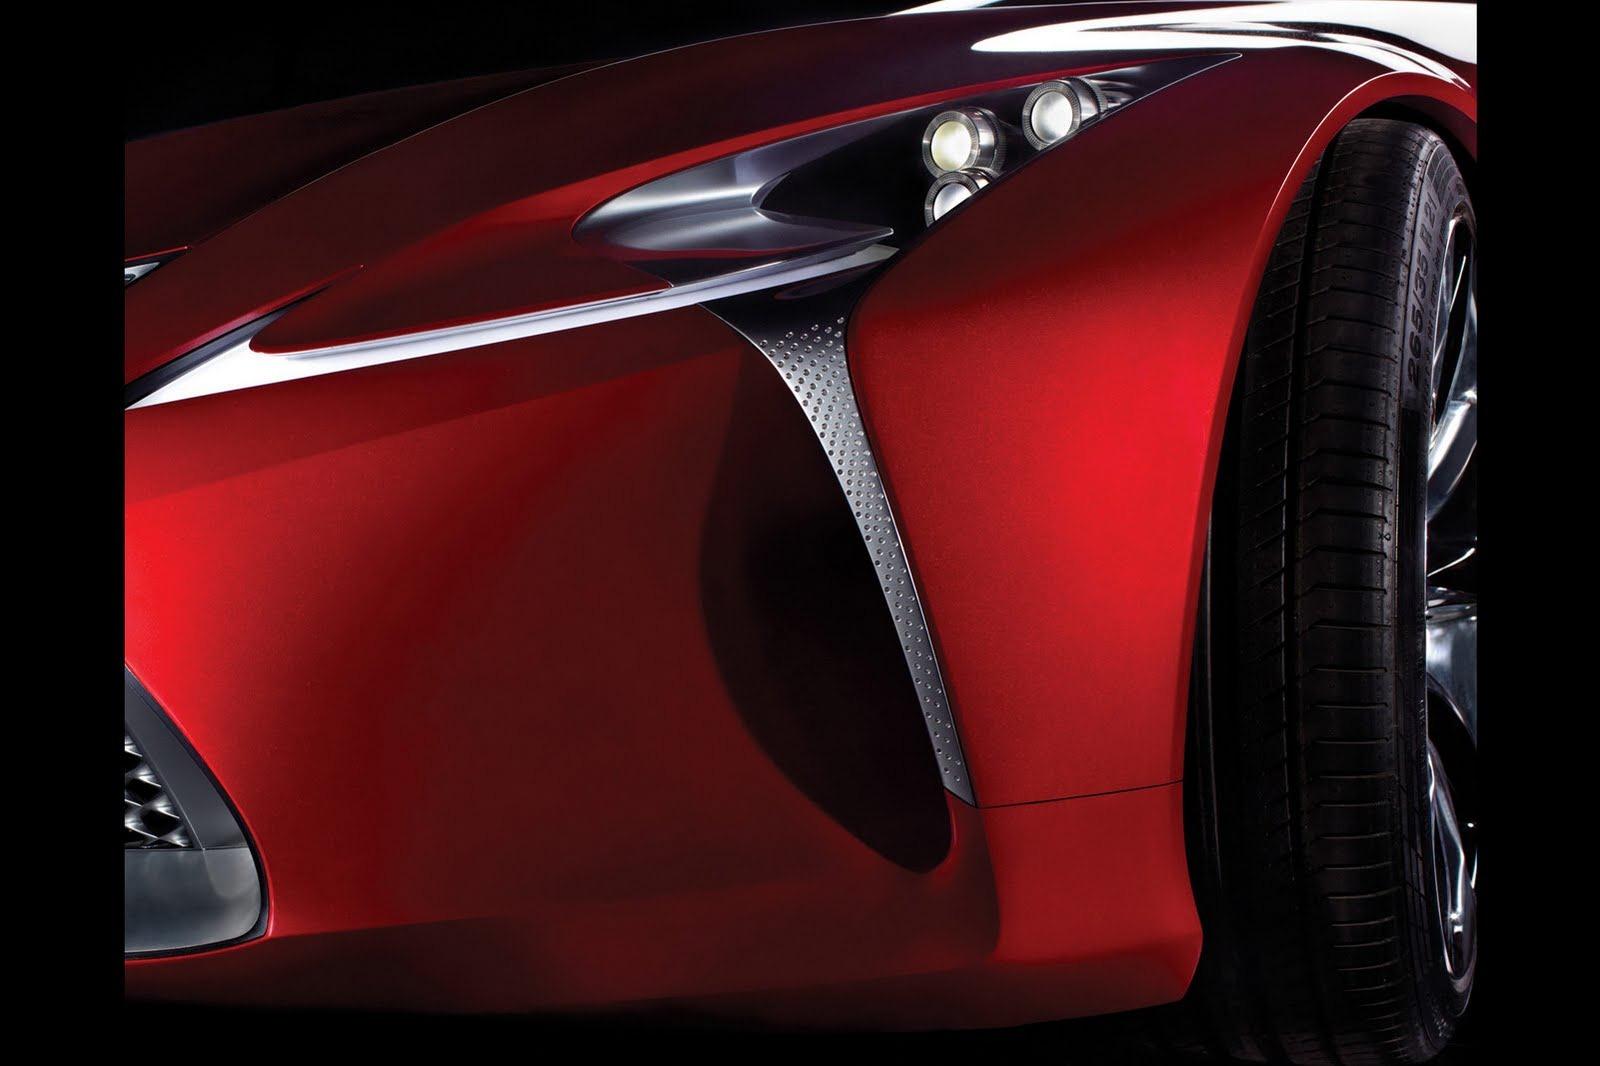 2012_lexus_lf_lc_hybrid_supercar_concept_04